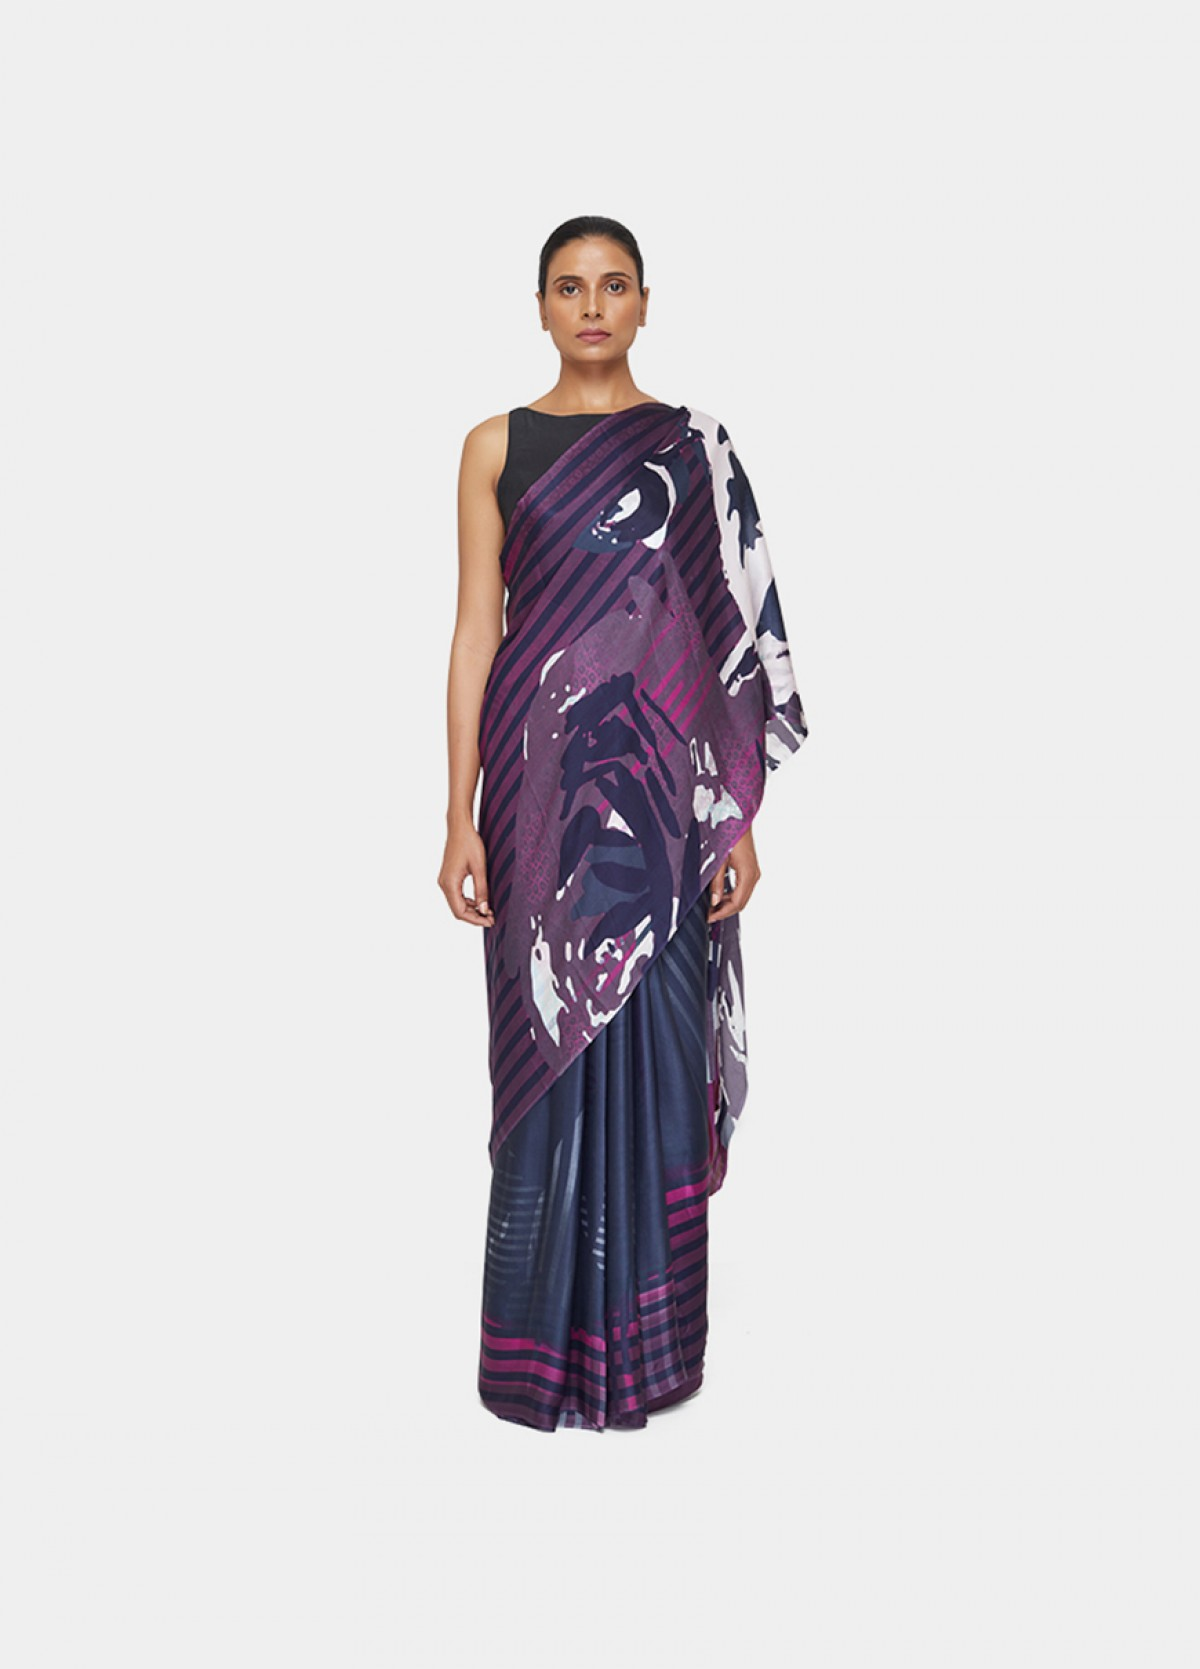 The Floral Streaks Sari